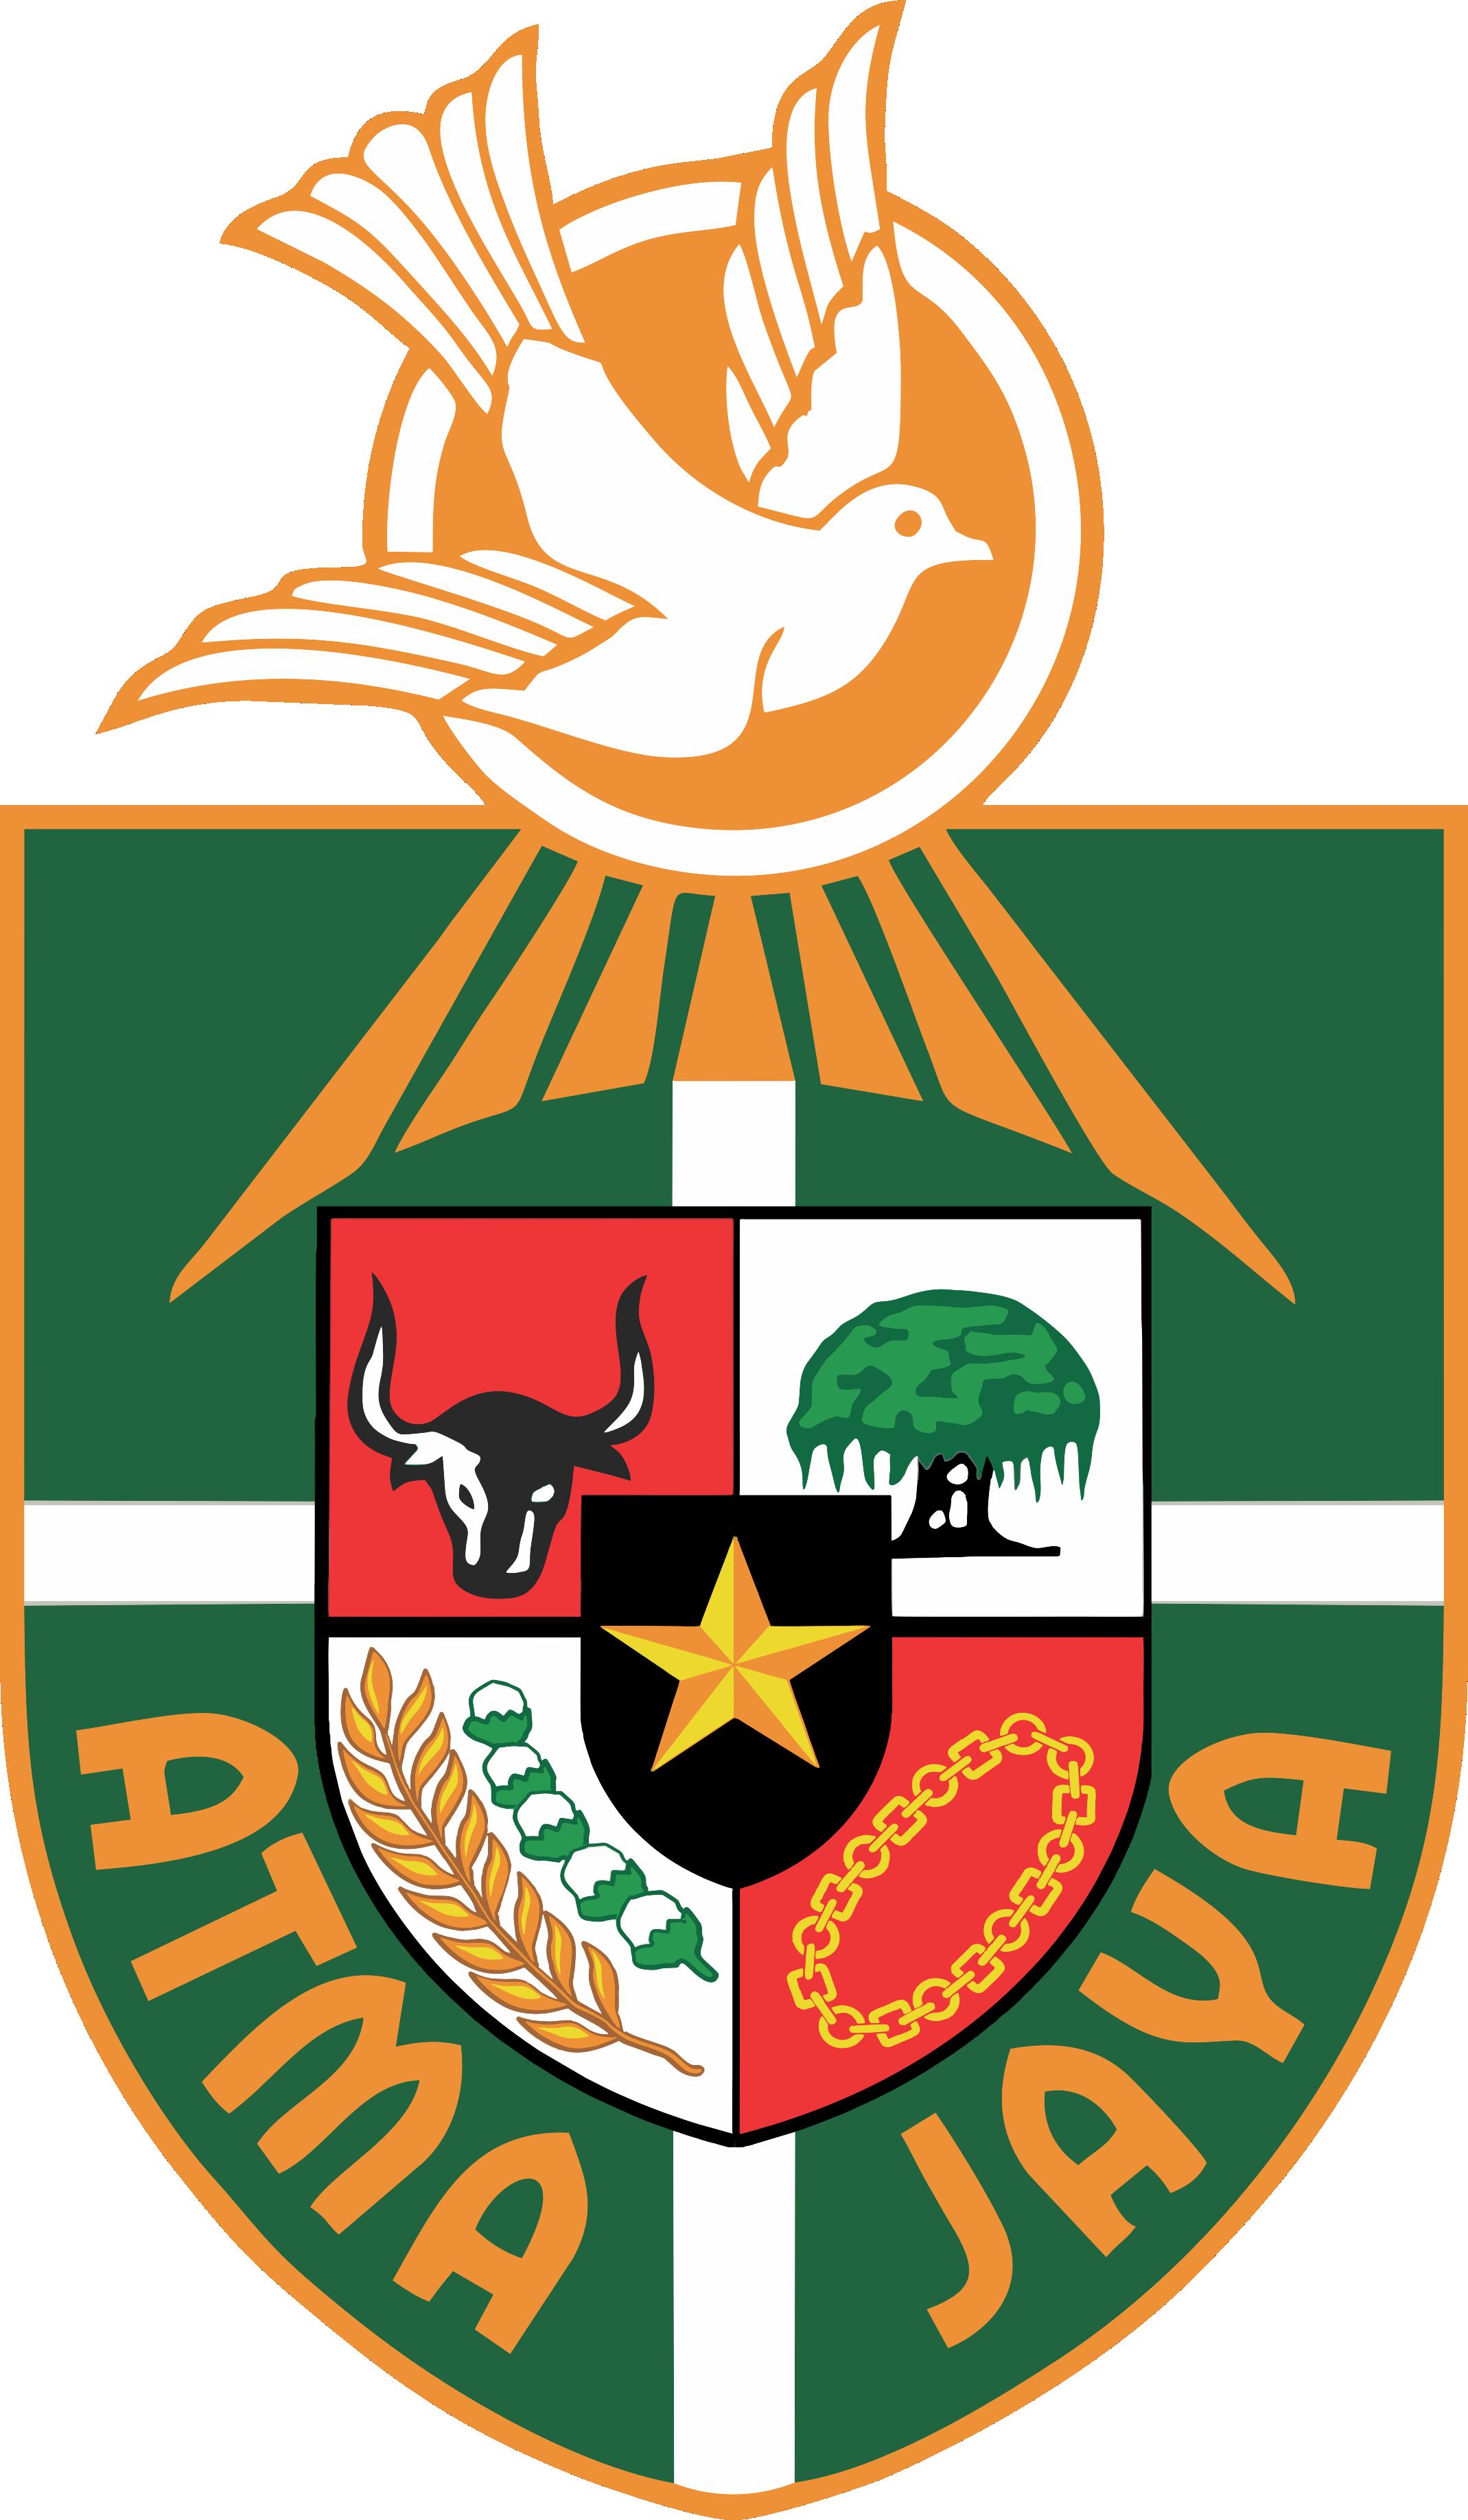 Rumah Sakit Akademik Atma Jaya